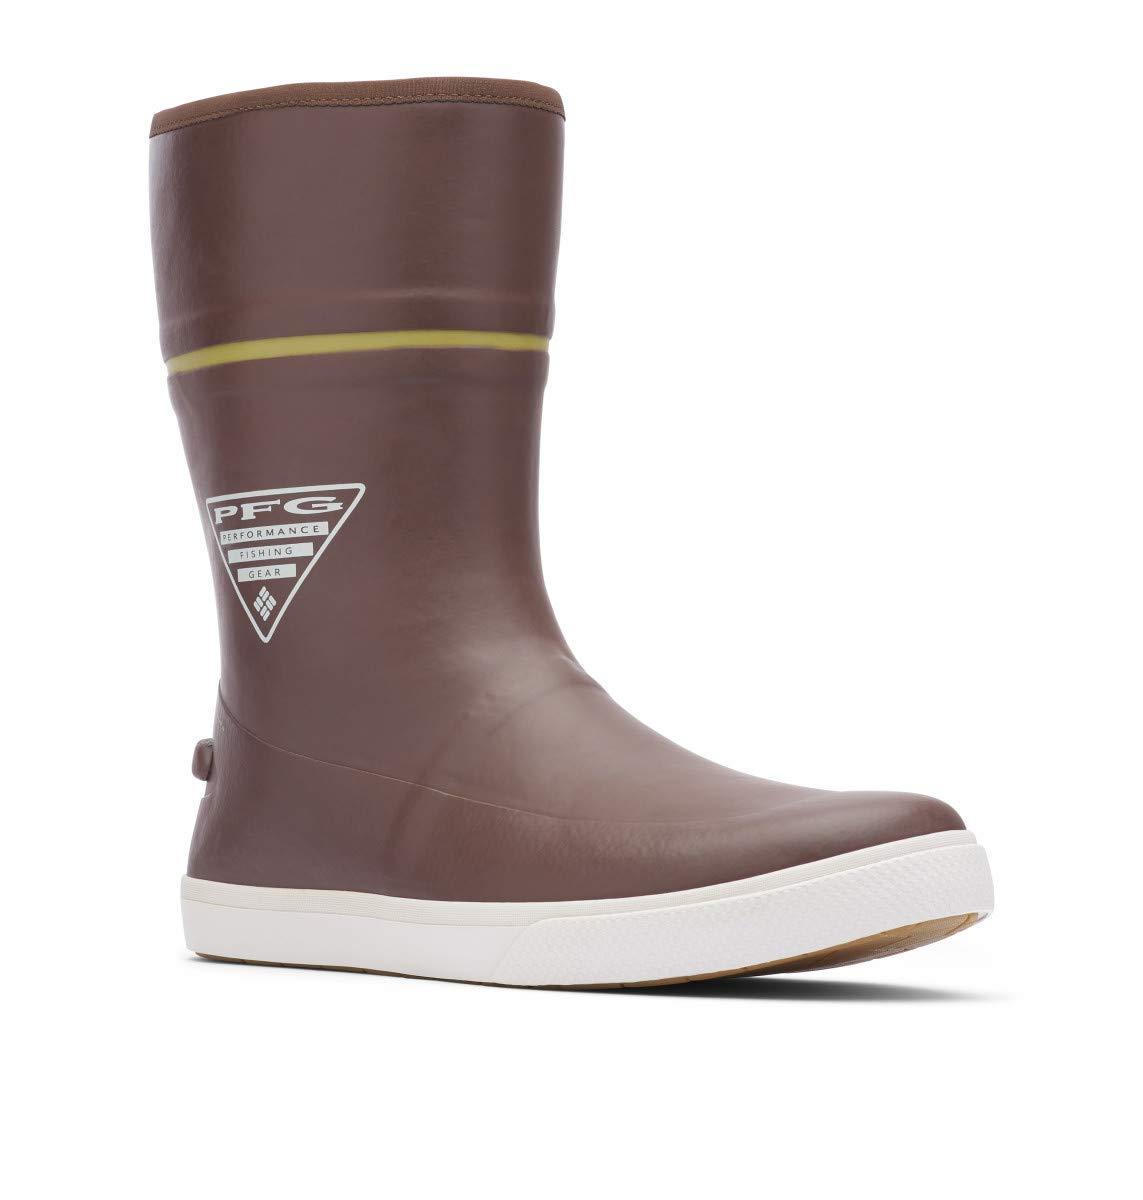 Columbia PFG Men's Dorado LITUP 10 PFG Rain Boot, Tobacco/Peppercorn, Regular US by Columbia